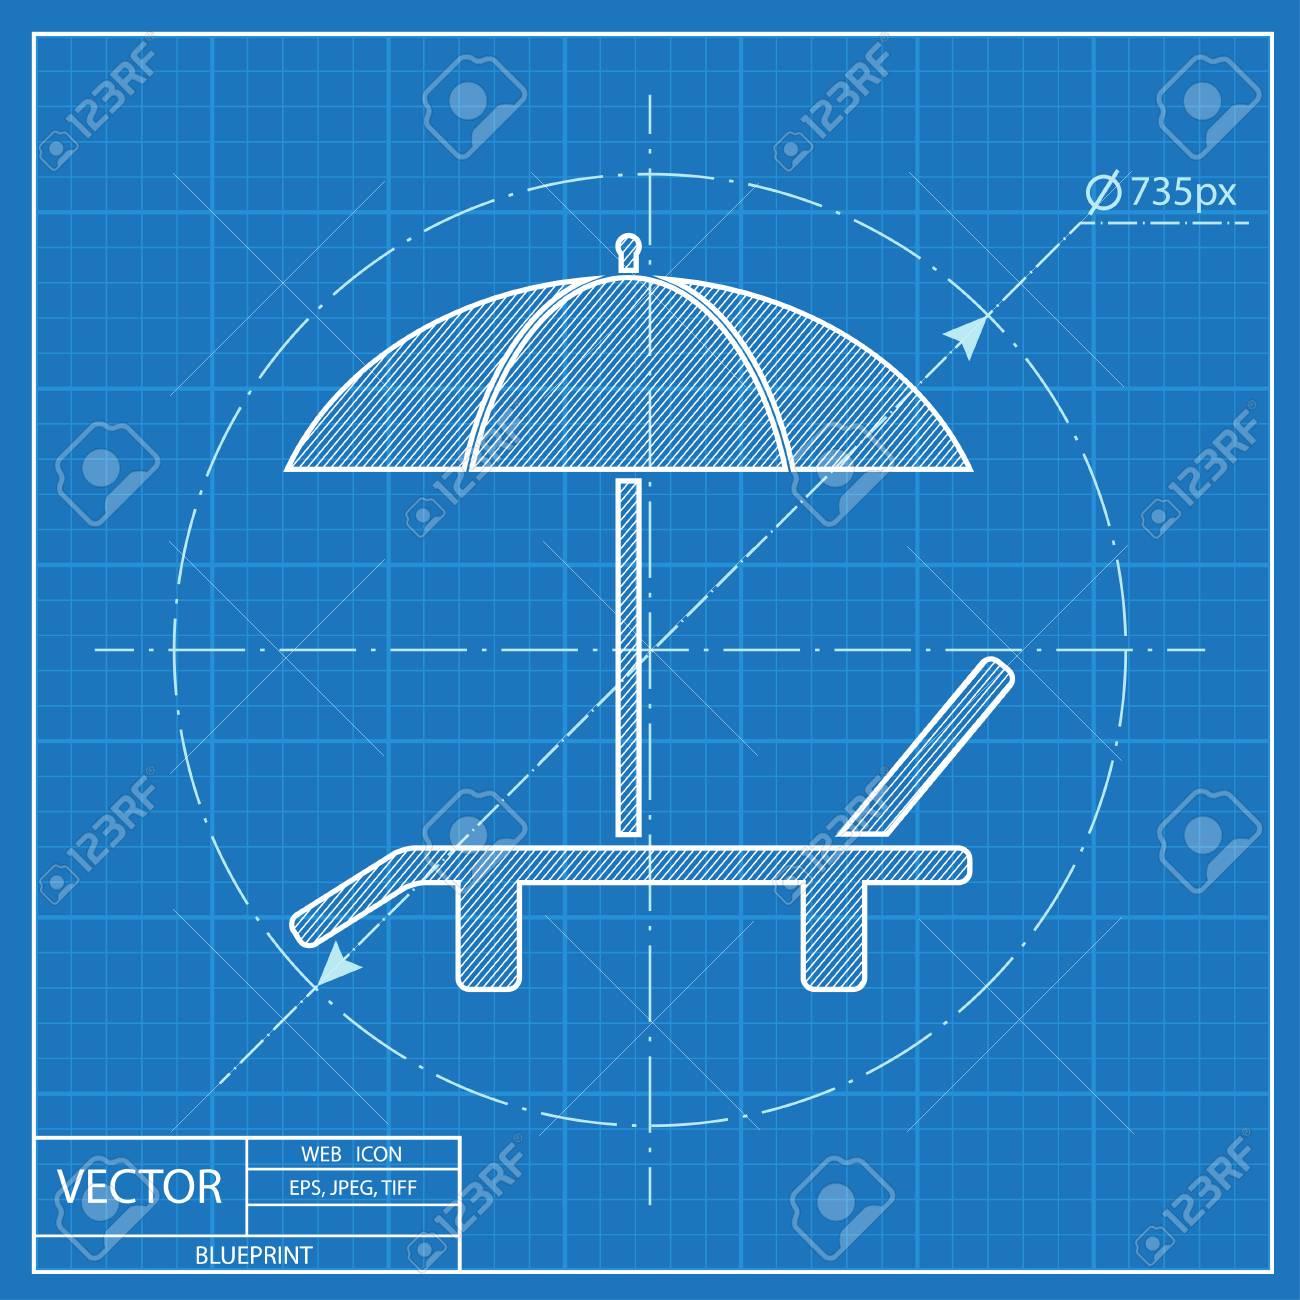 beach vector blueprint icon umbrella with deck chair royalty free